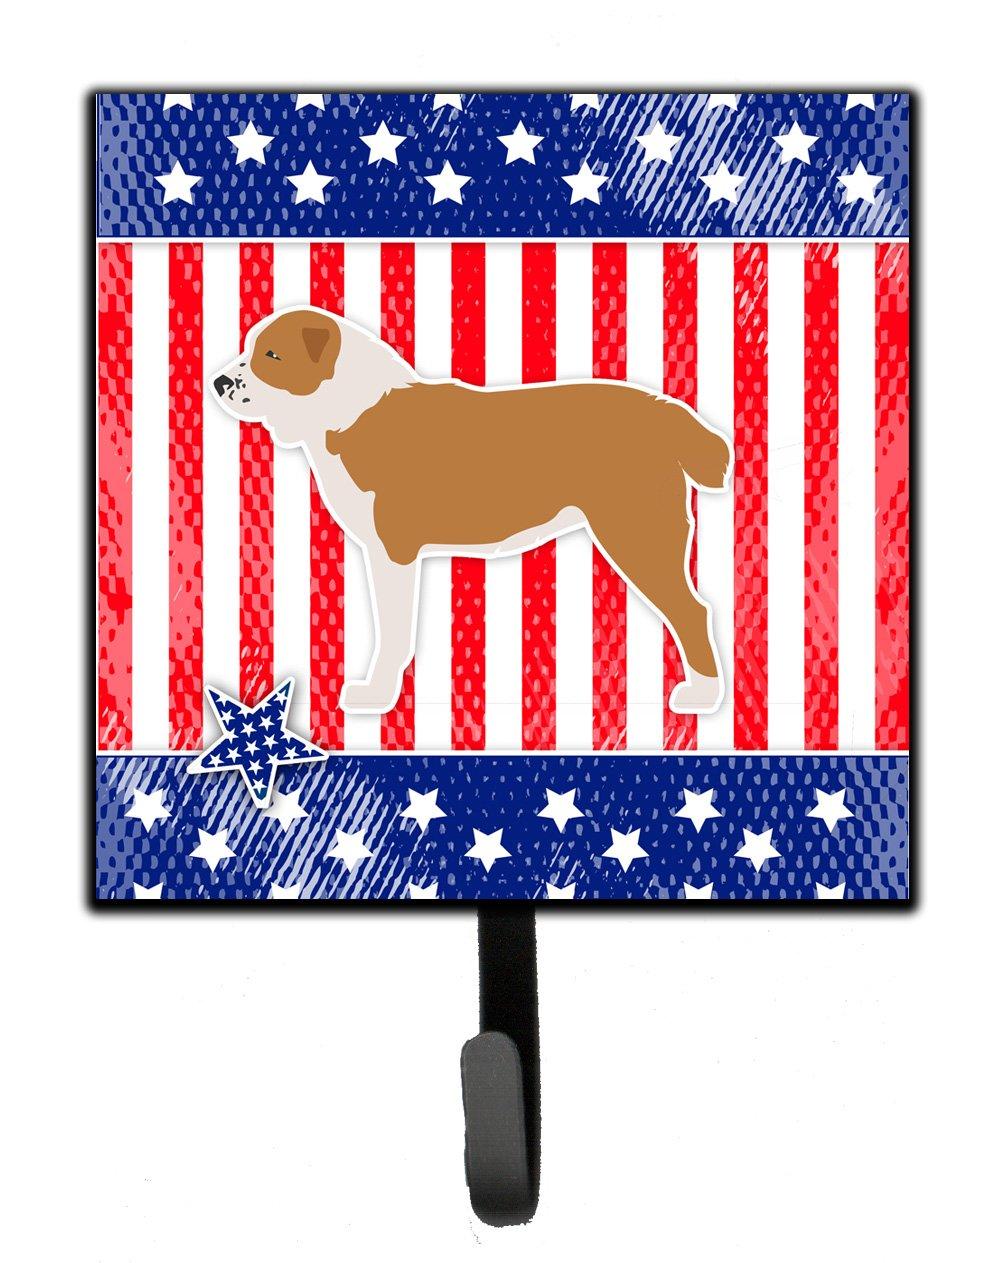 Carolines Treasures USA Patriotic Central Asian Shepherd Dog Leash or Key Holder BB3328SH4 Small Multicolor